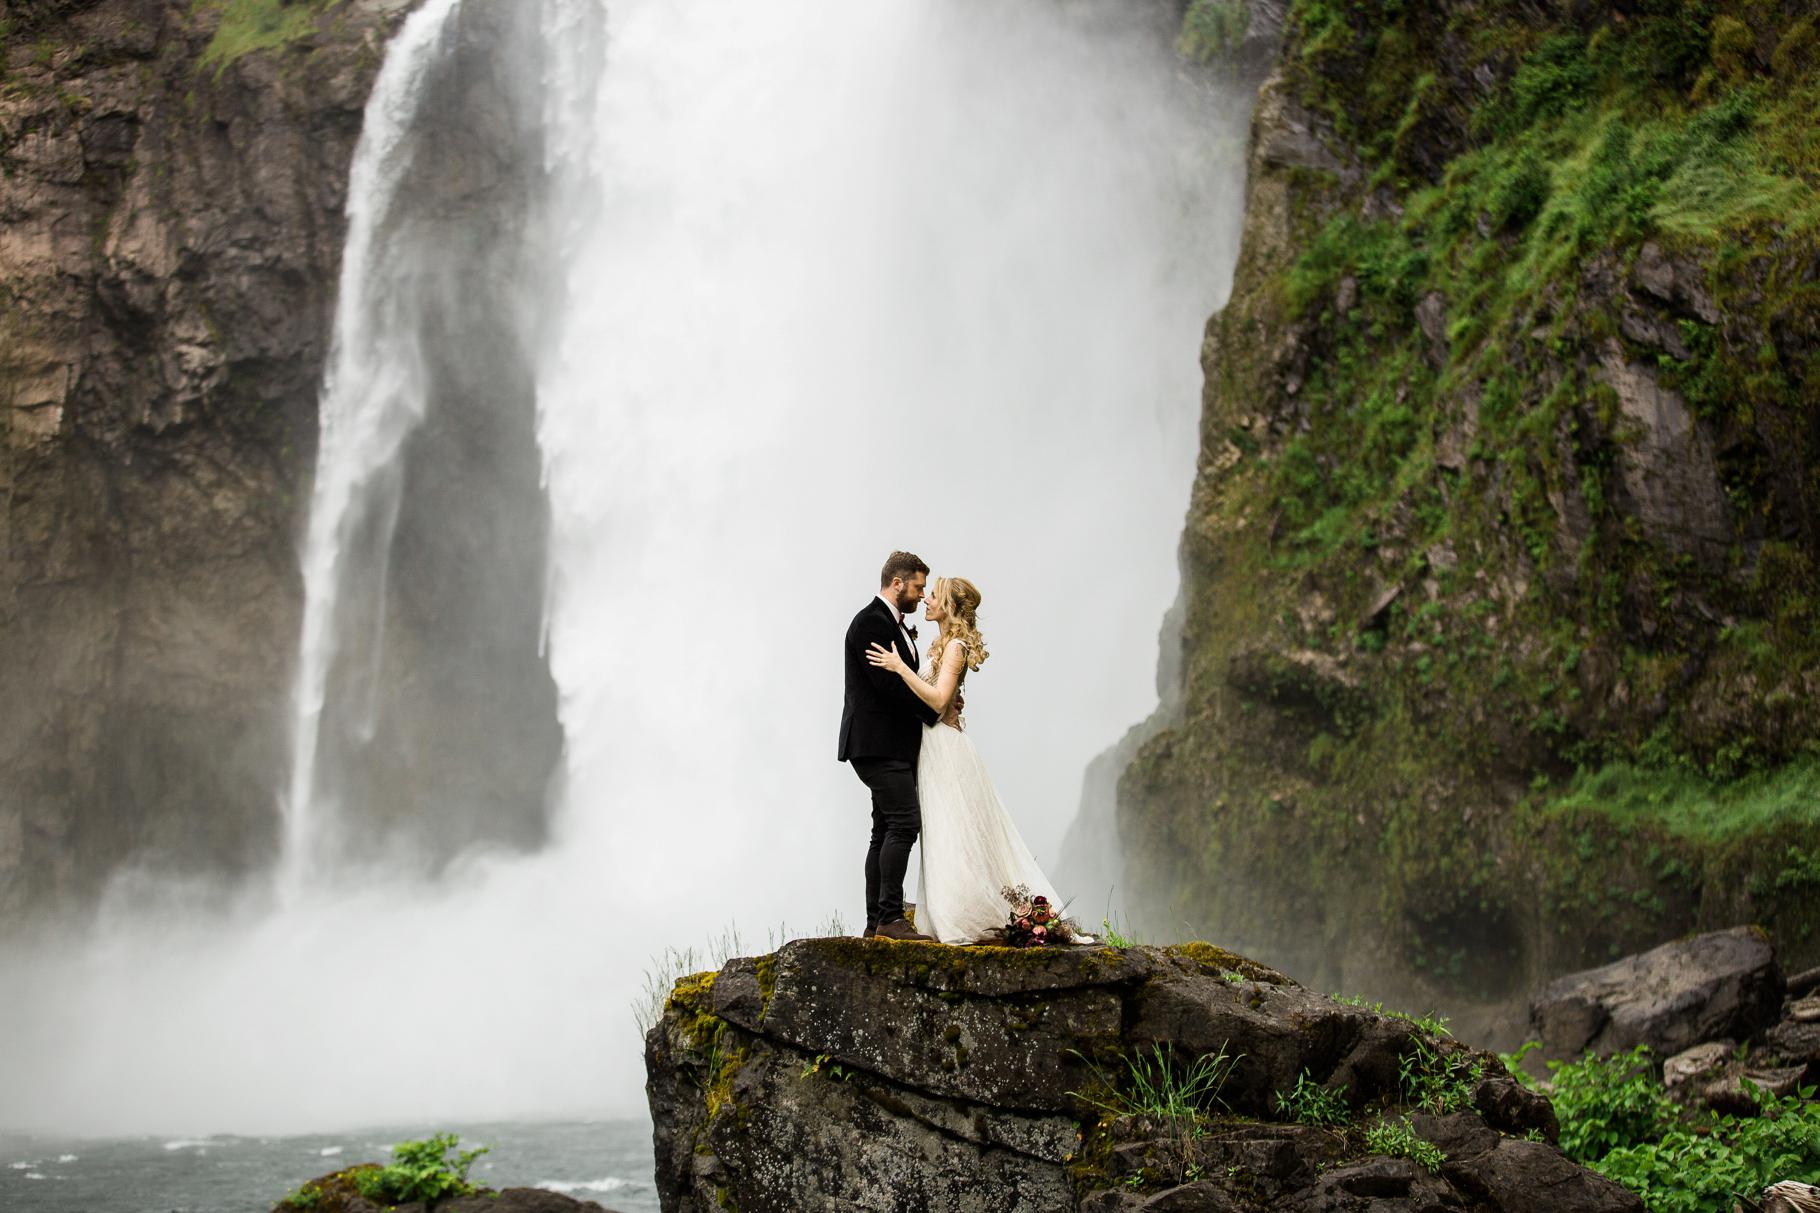 23-Adventure-Elopement-Waterfall-Seattle-Wedding-Photographer-Snoqualmie-Falls-Hike